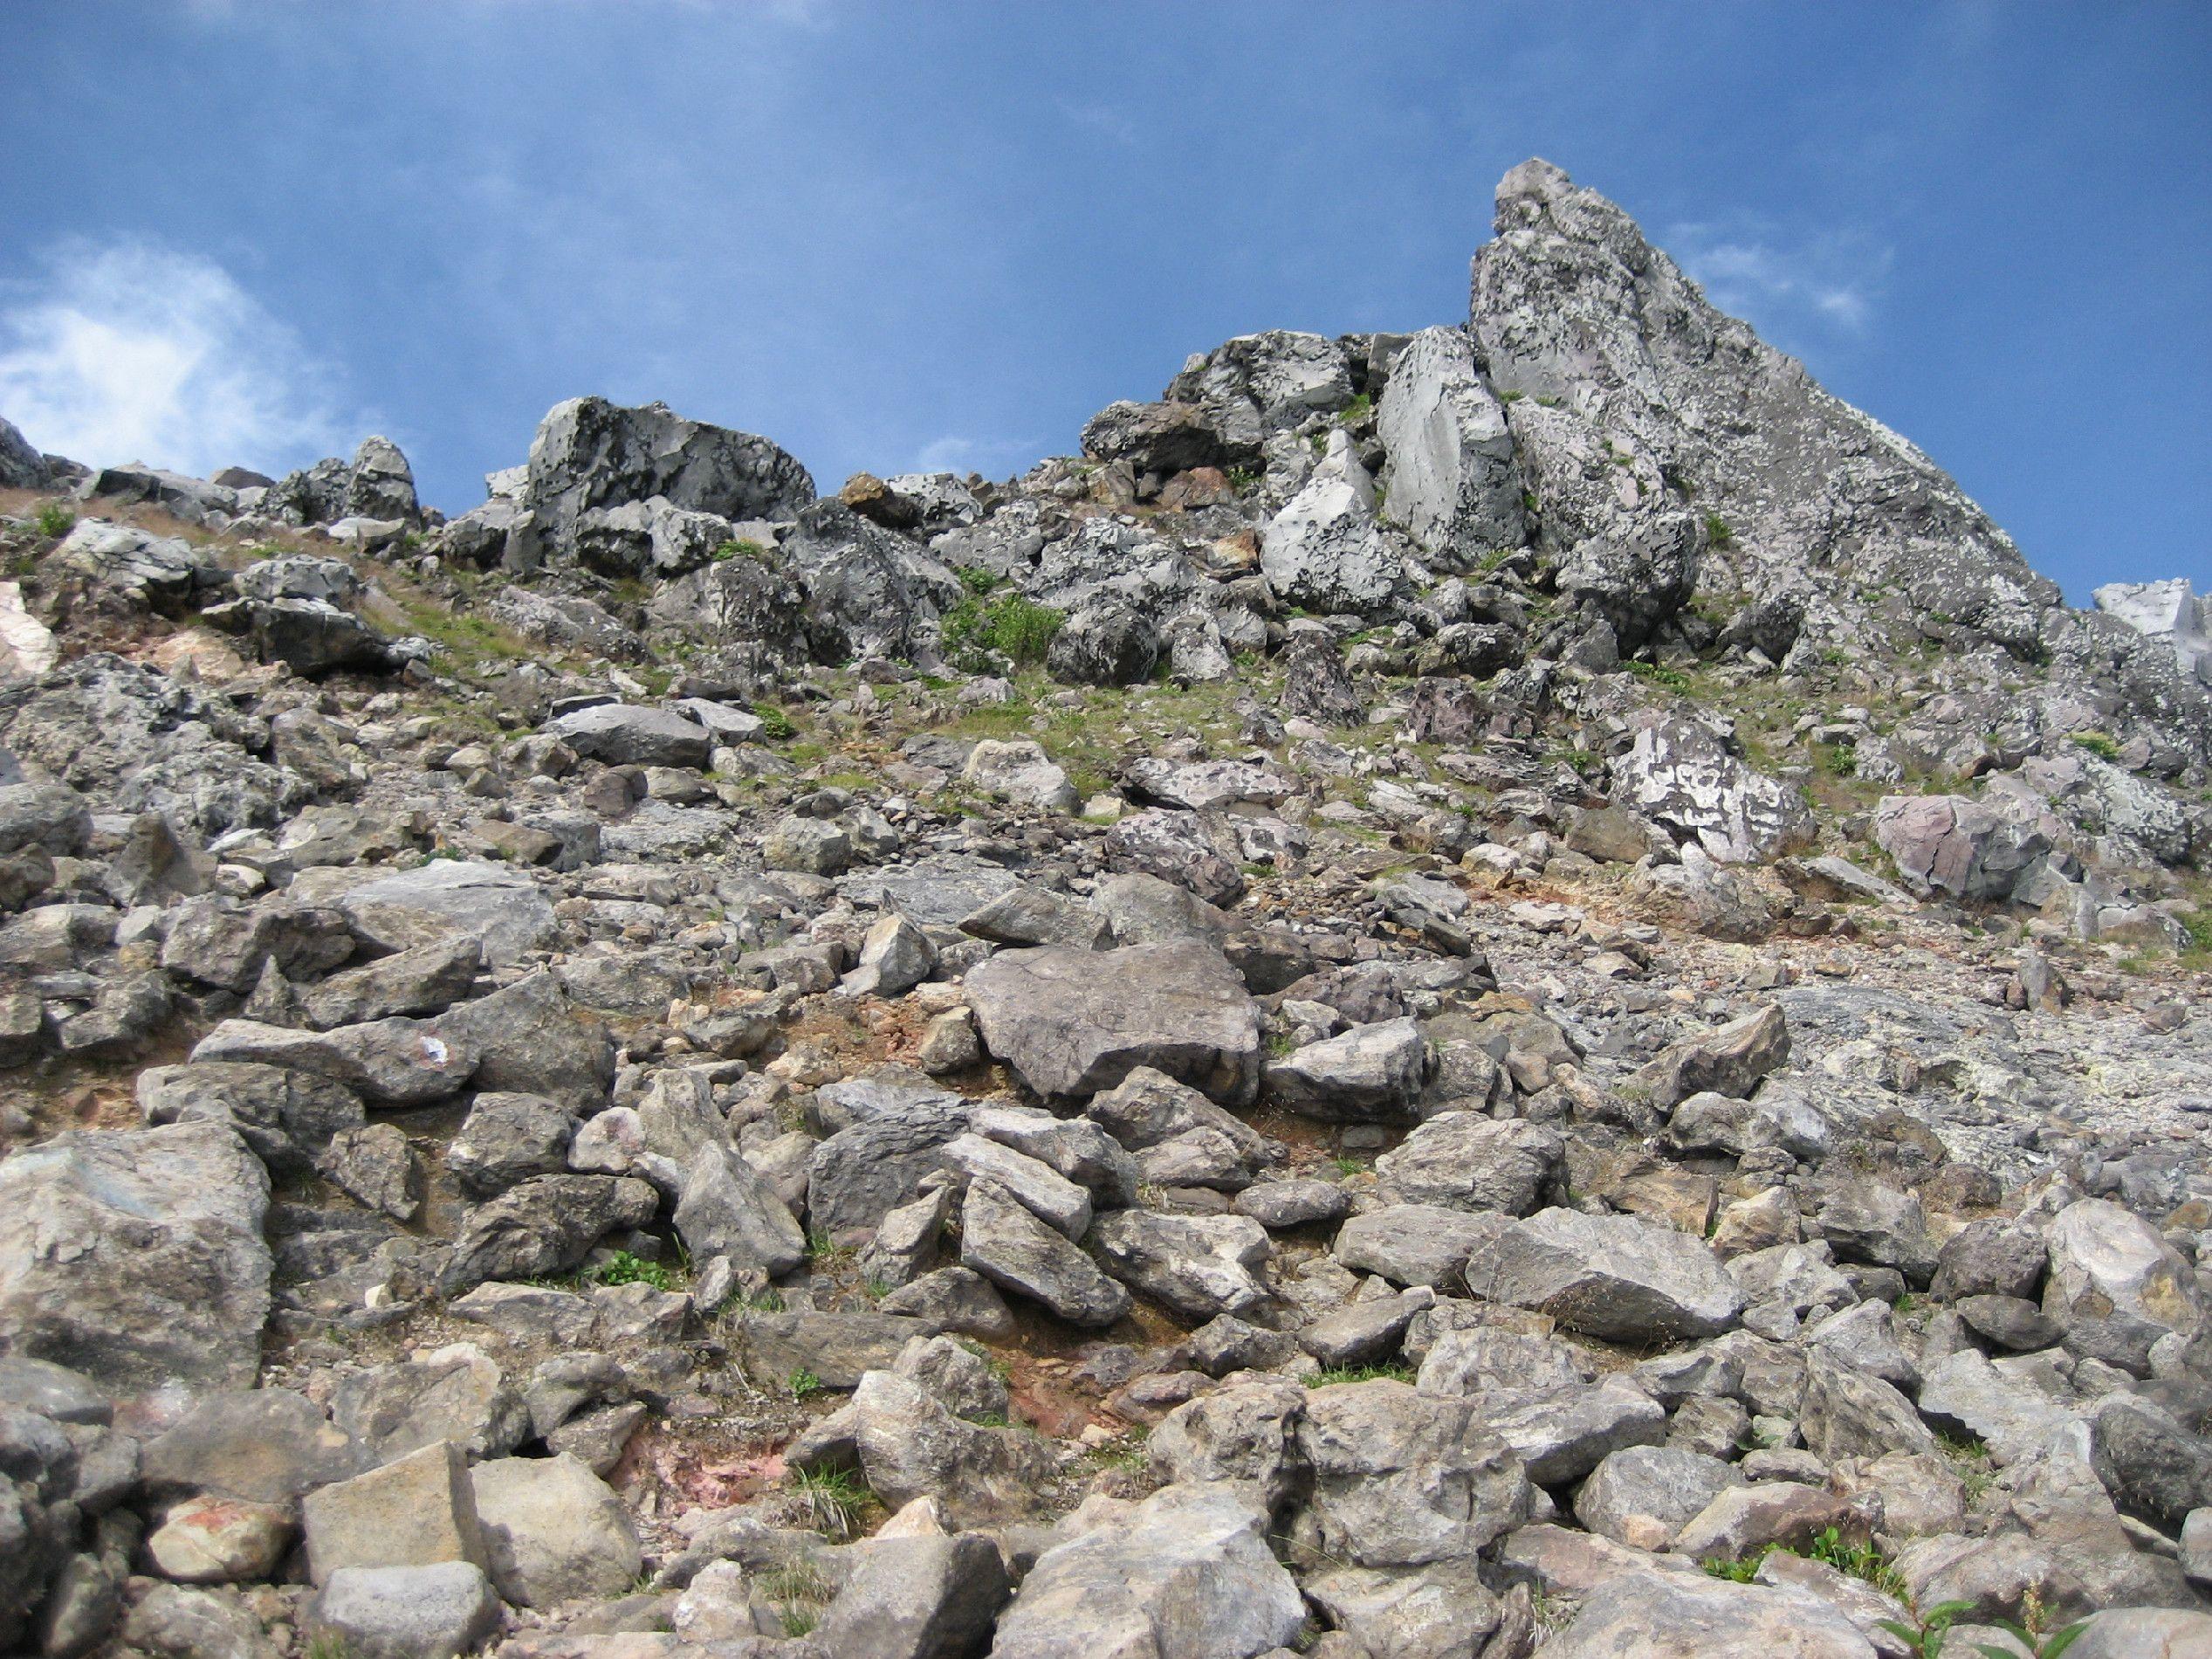 「岩場」の画像検索結果